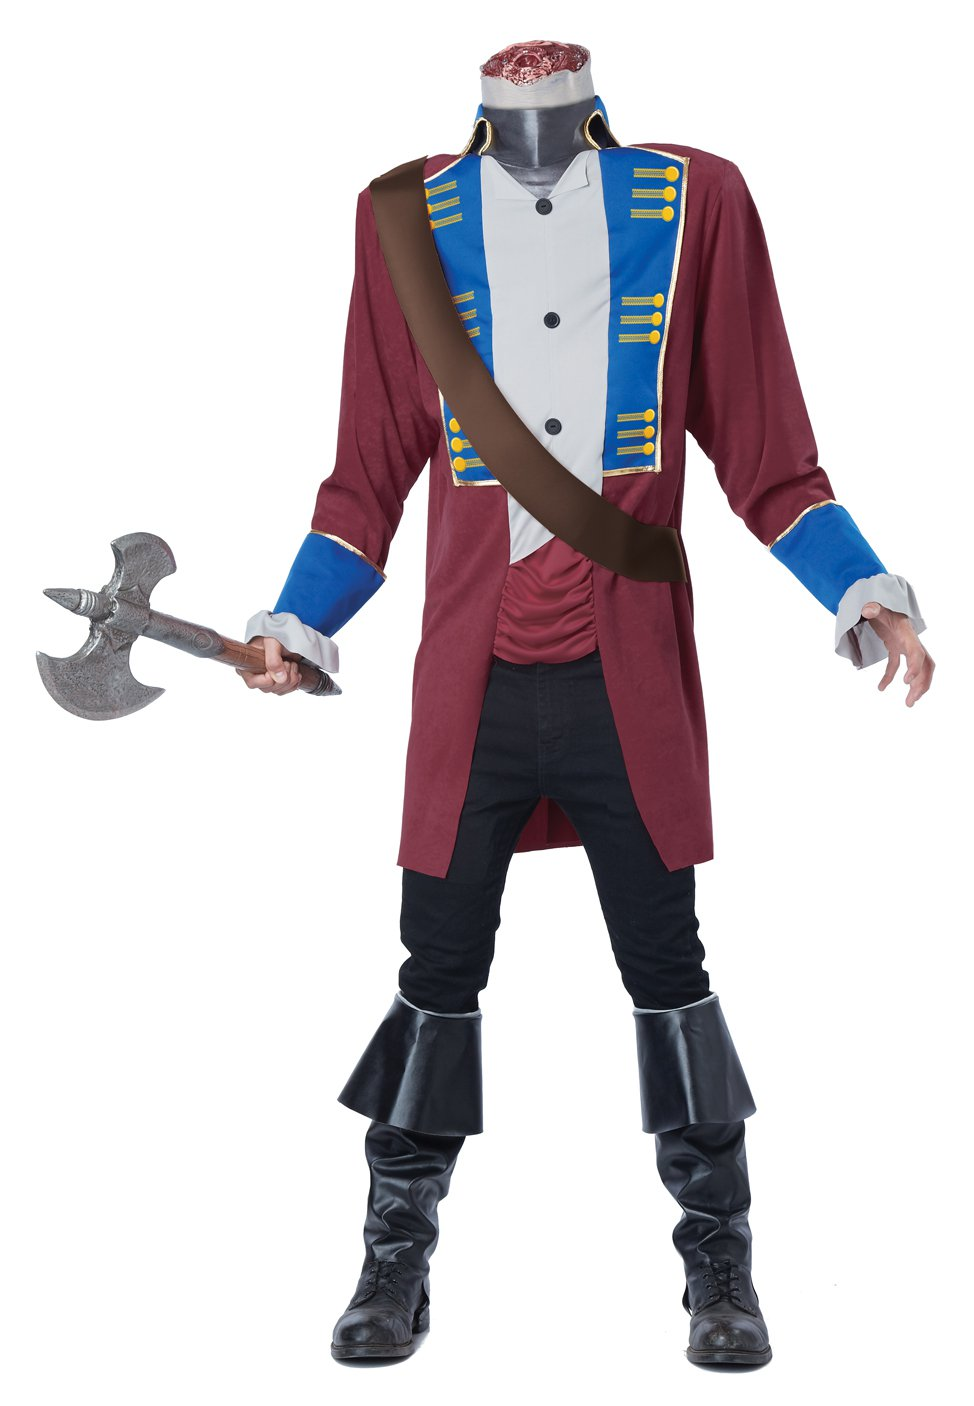 Sleepy Hollow Headless Horseman Adult Costume Size: Small #01598